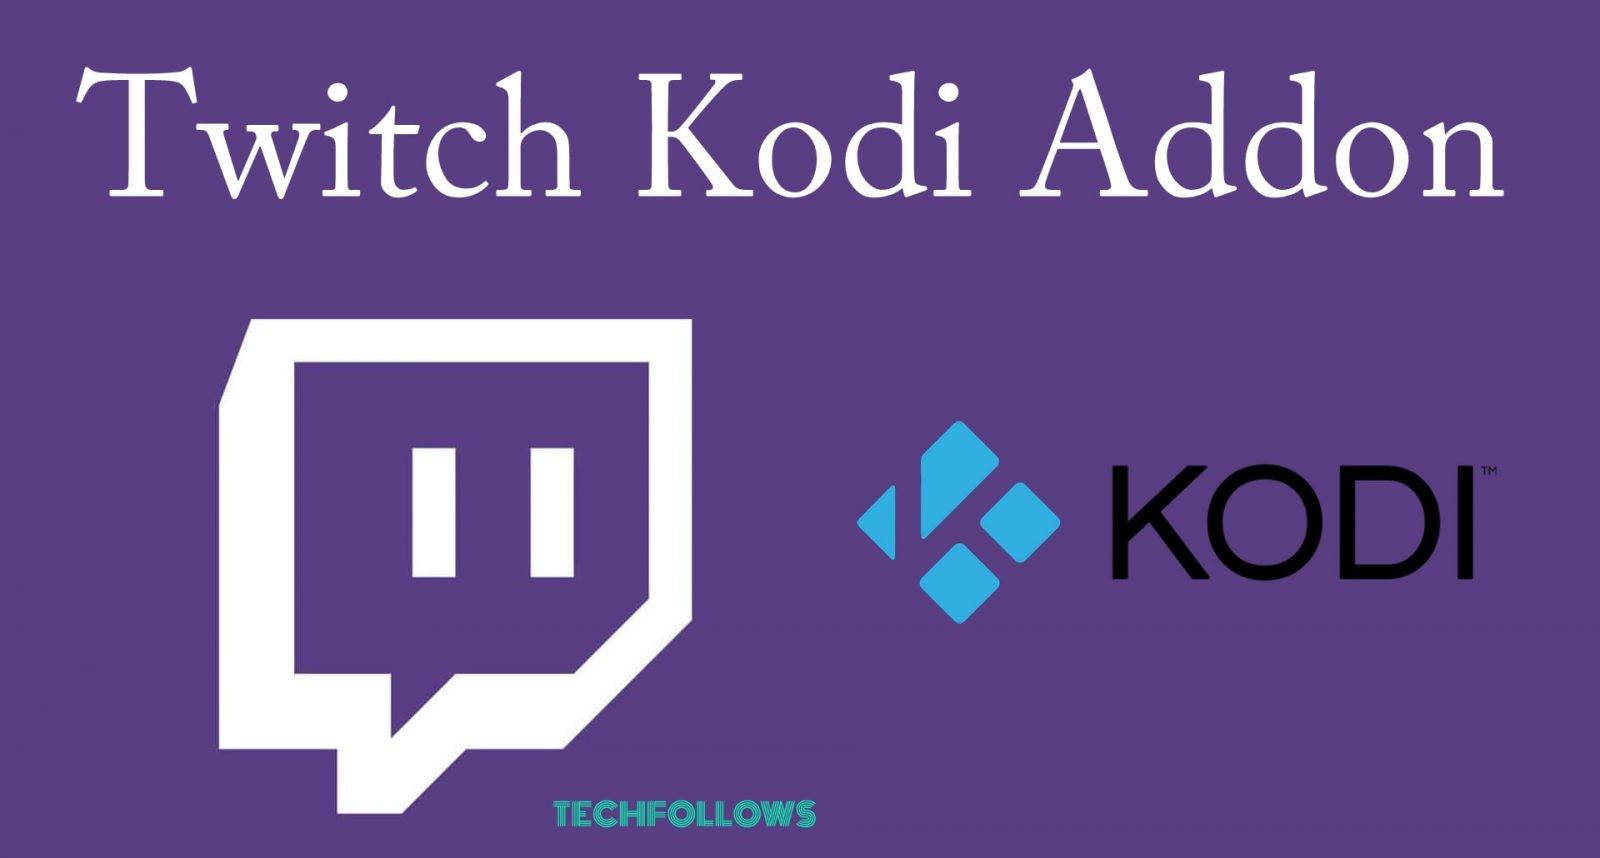 How to Install Twitch Kodi Addon [2019]? - Tech Follows